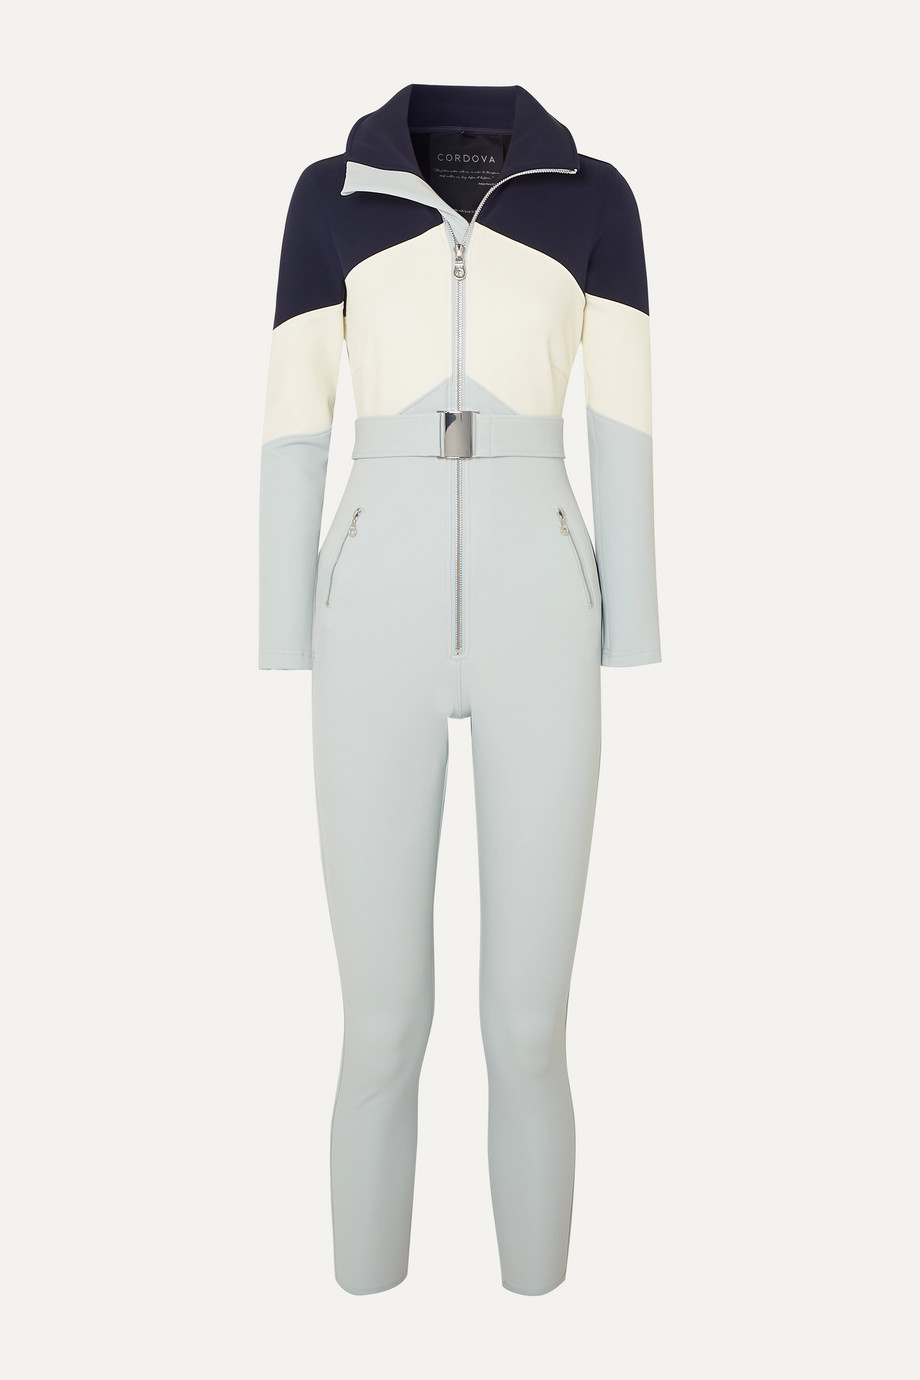 Cordova Alta belted stretch ski suit